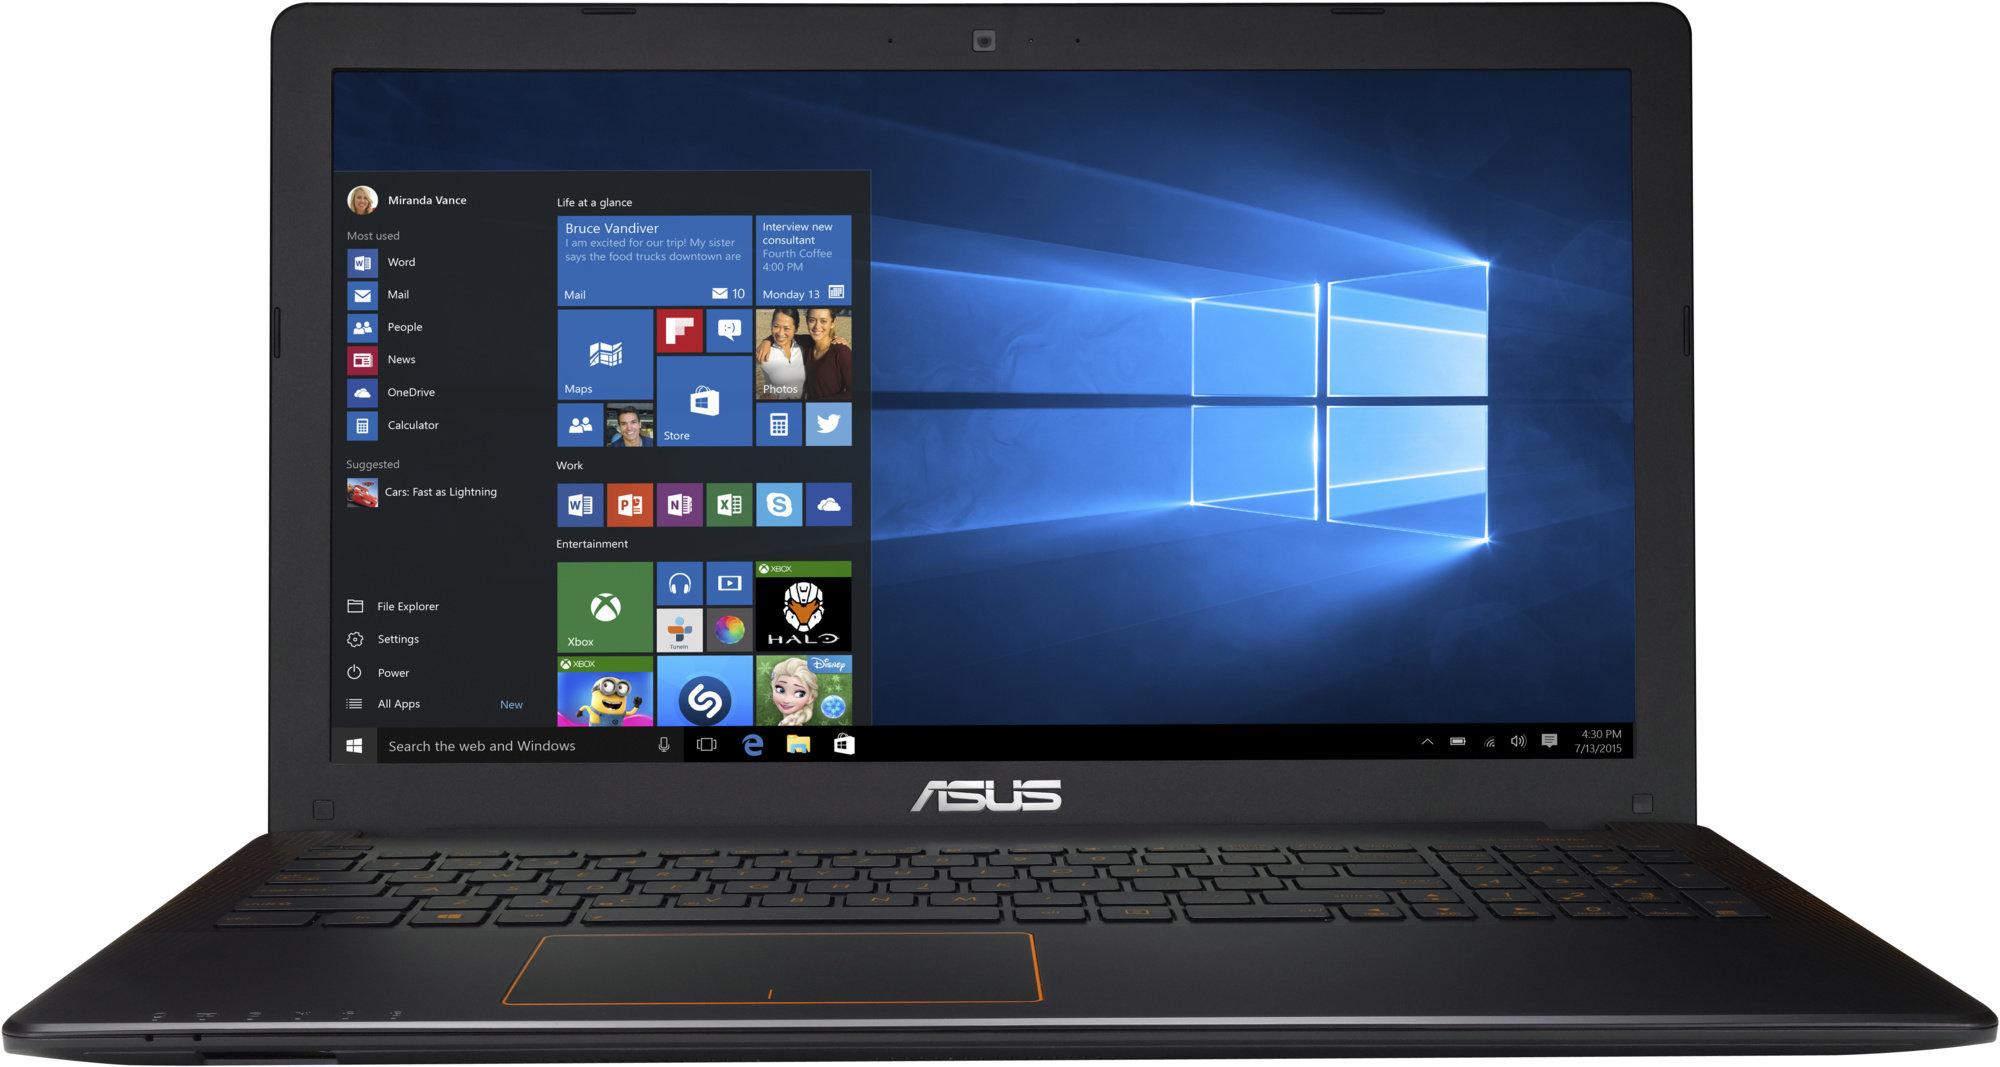 "ASUS F550VX-DM588 i5-7300HQ/4GB/1TB 7200 ot./DVDRW/GeForce GTX 950M/15.6"" FHD LED matný/Black"